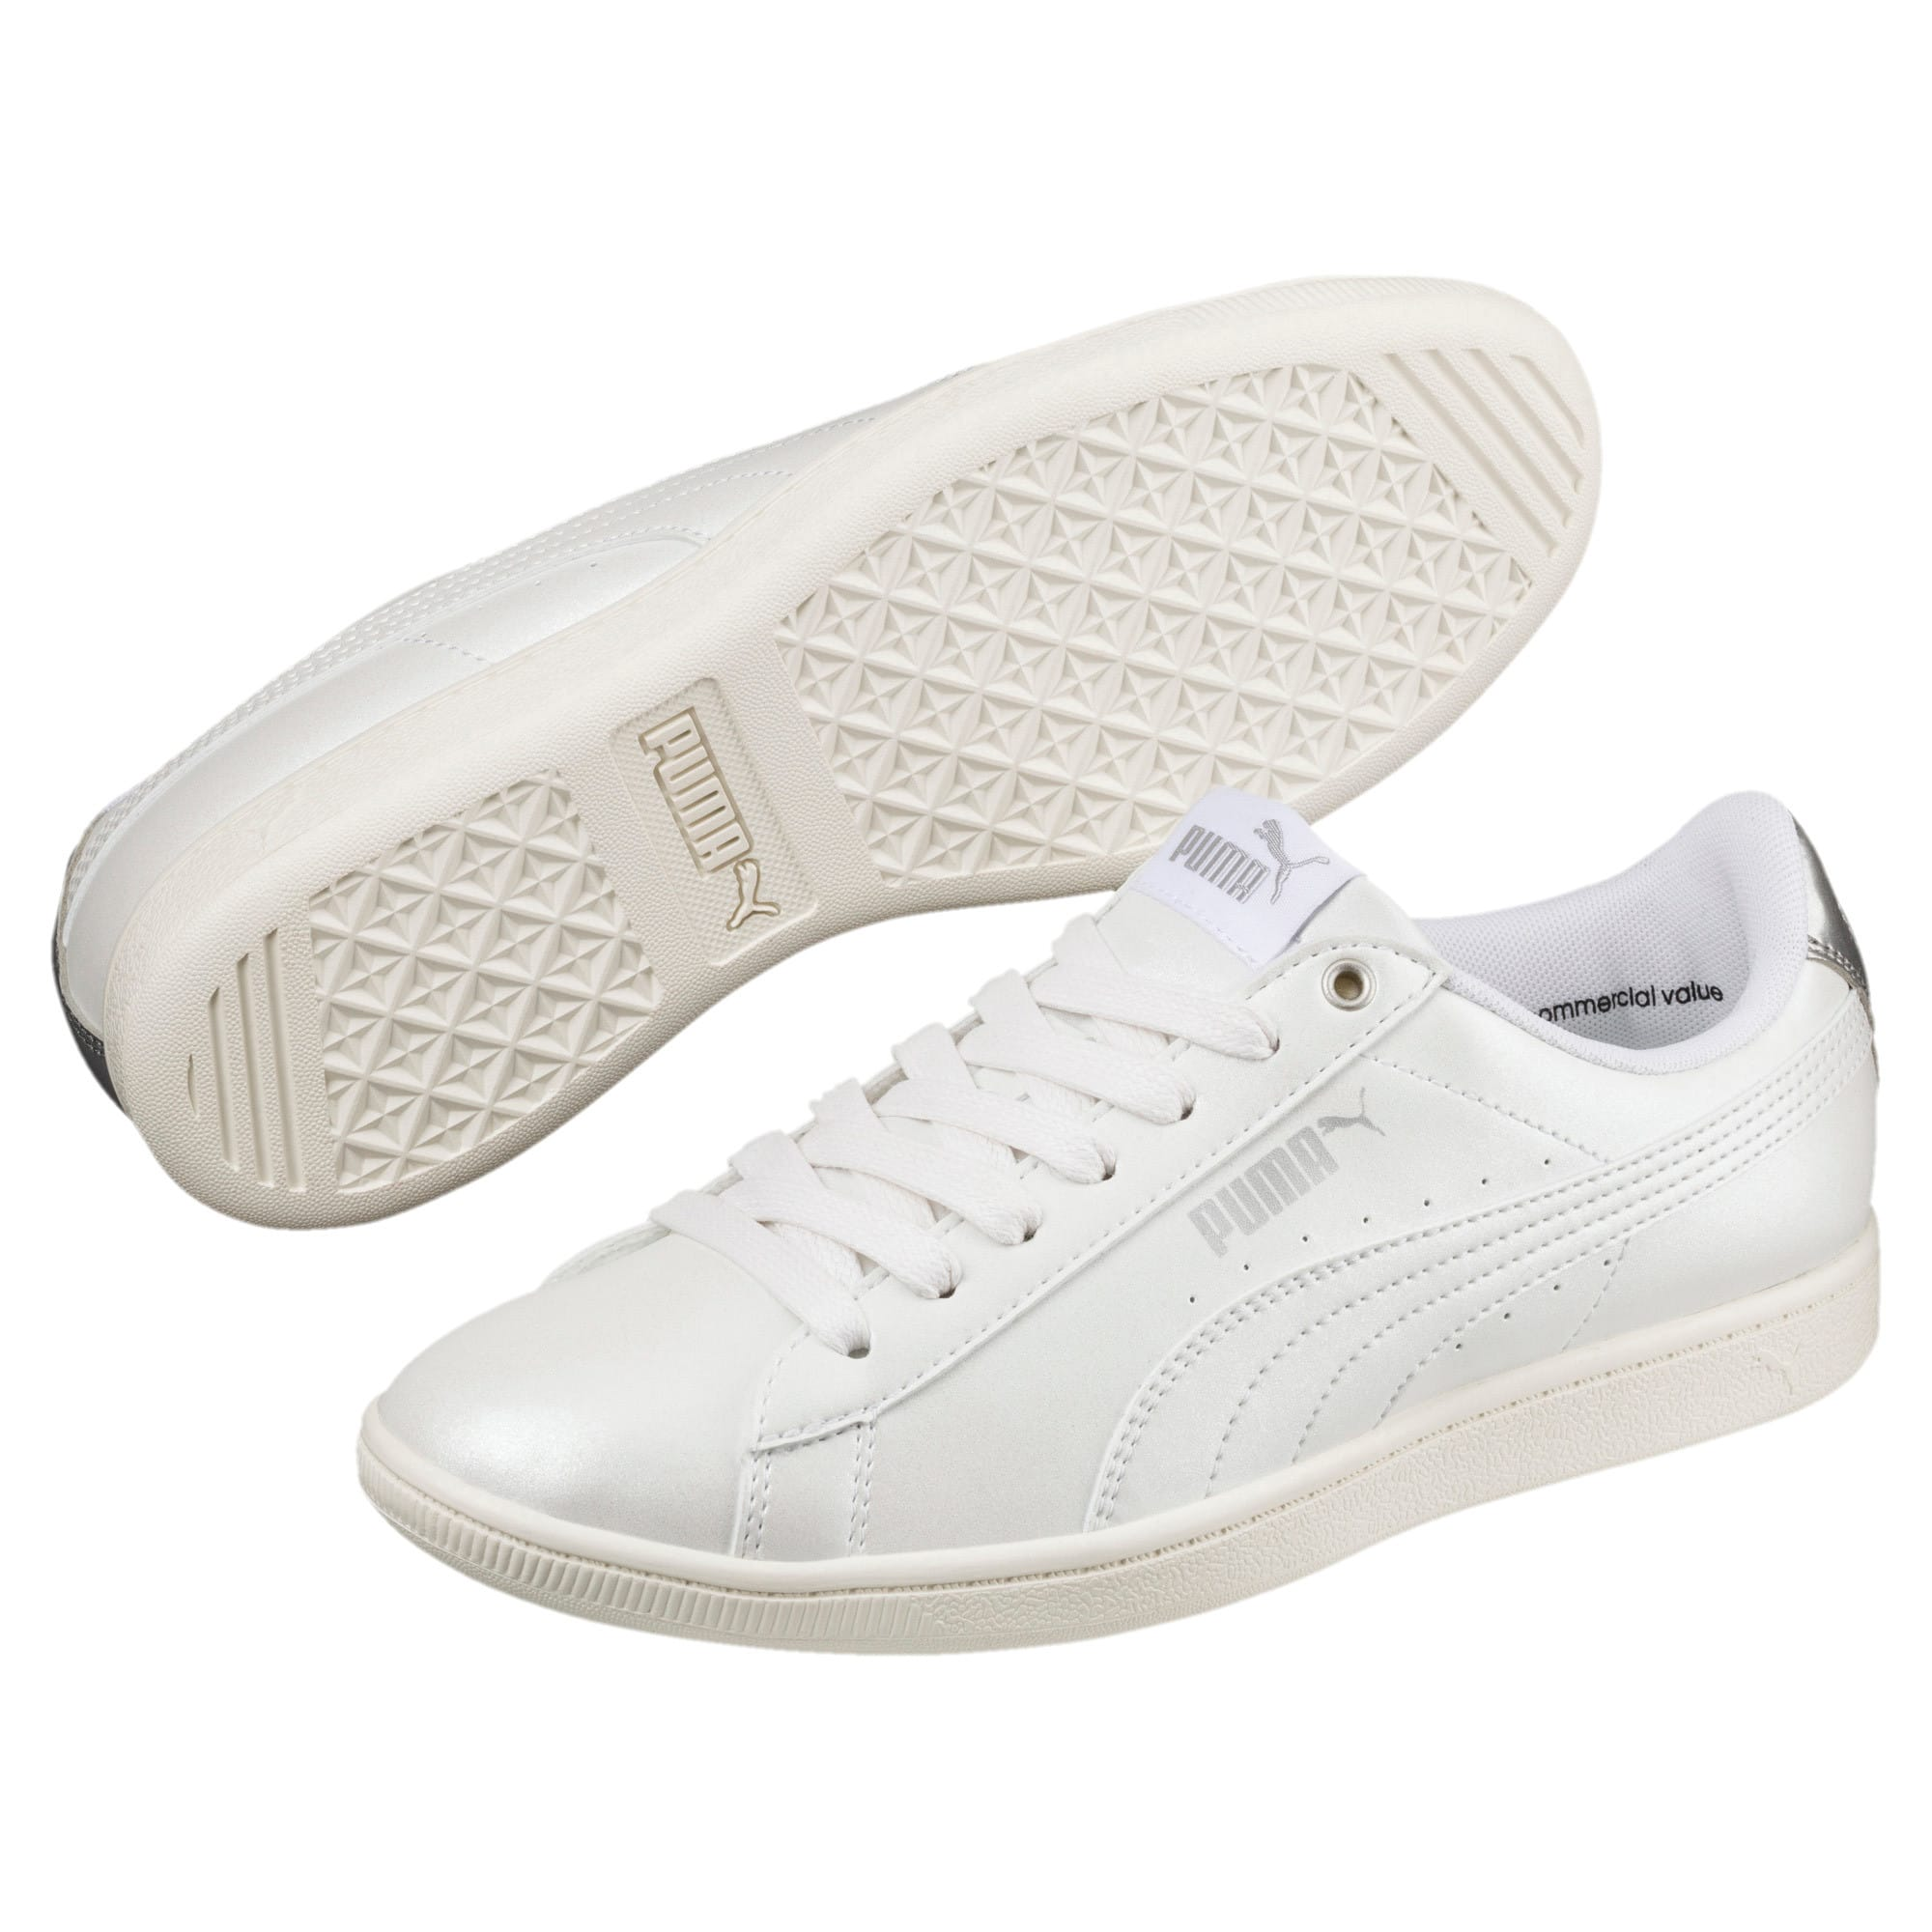 Thumbnail 2 of Puma Vikky LX Sneakers, Puma White-White-Whisper, medium